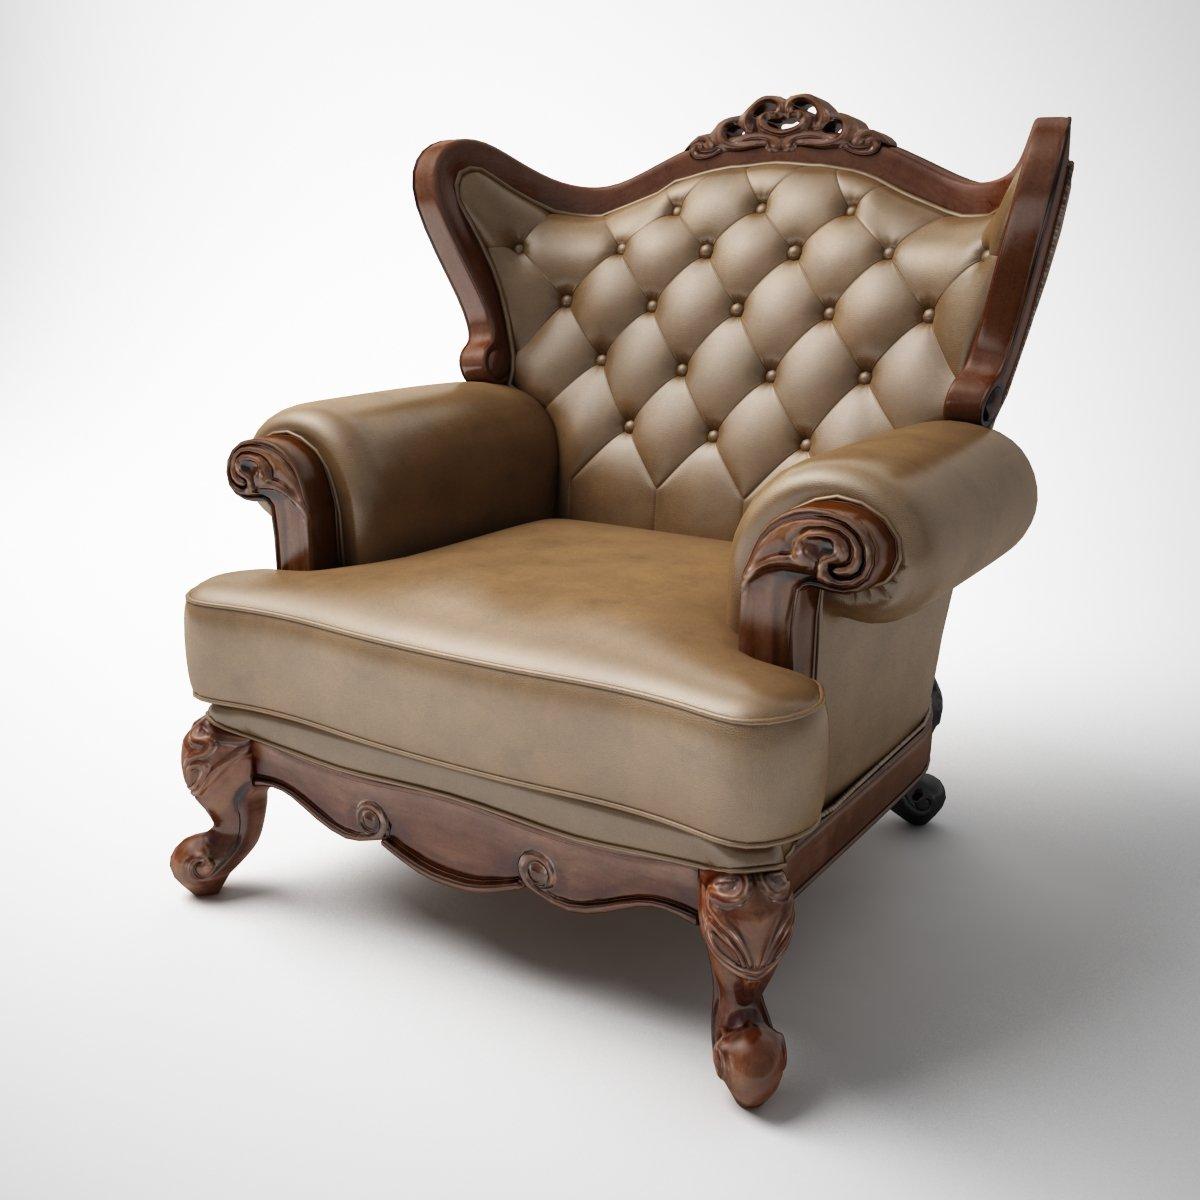 Single person classic leather sofa 3D Model in Sofa 3DExport